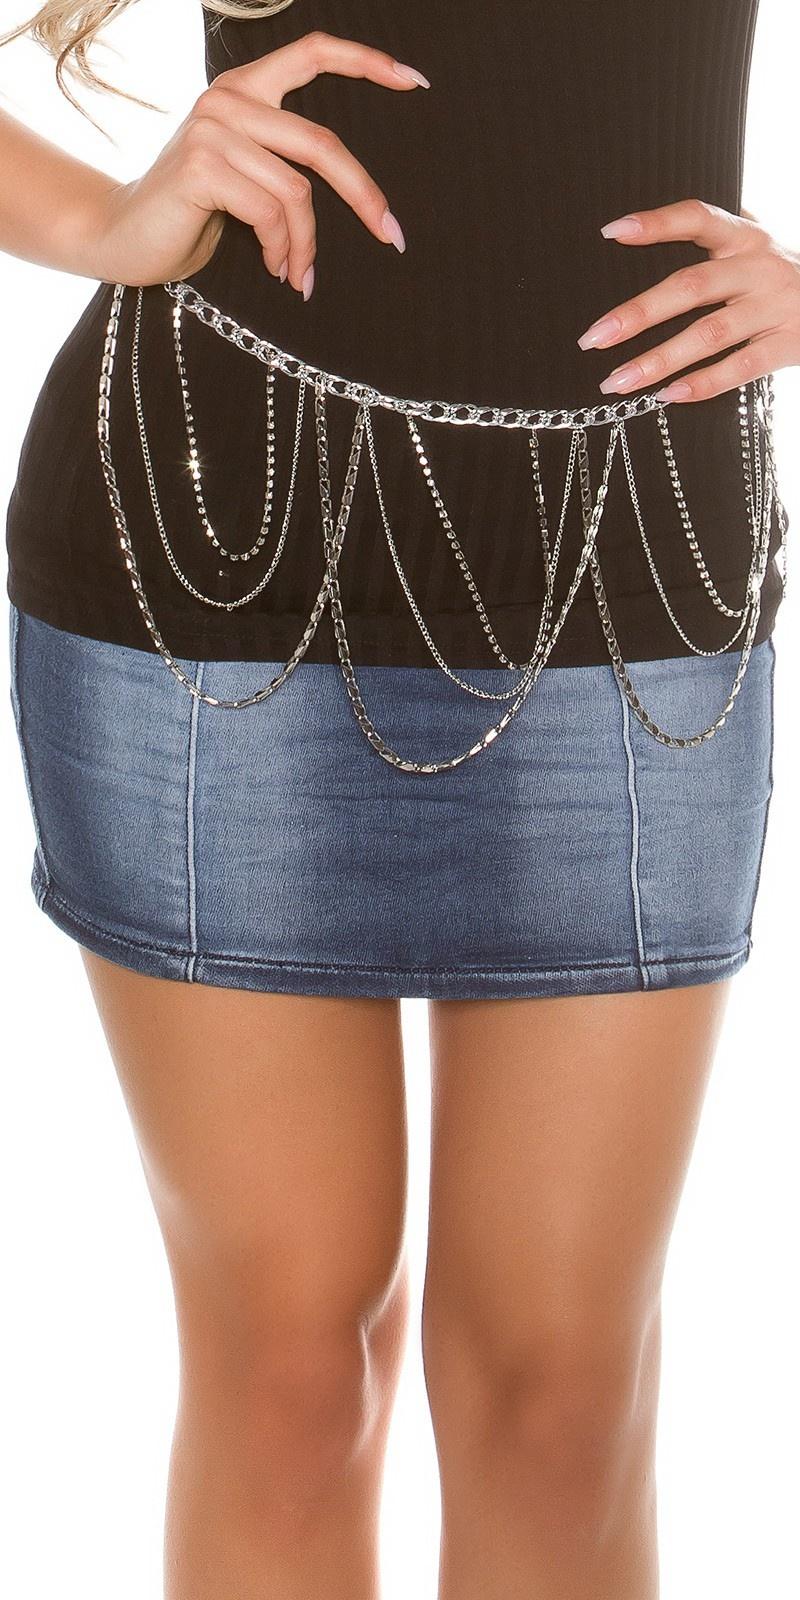 Trendy chain belt Silver